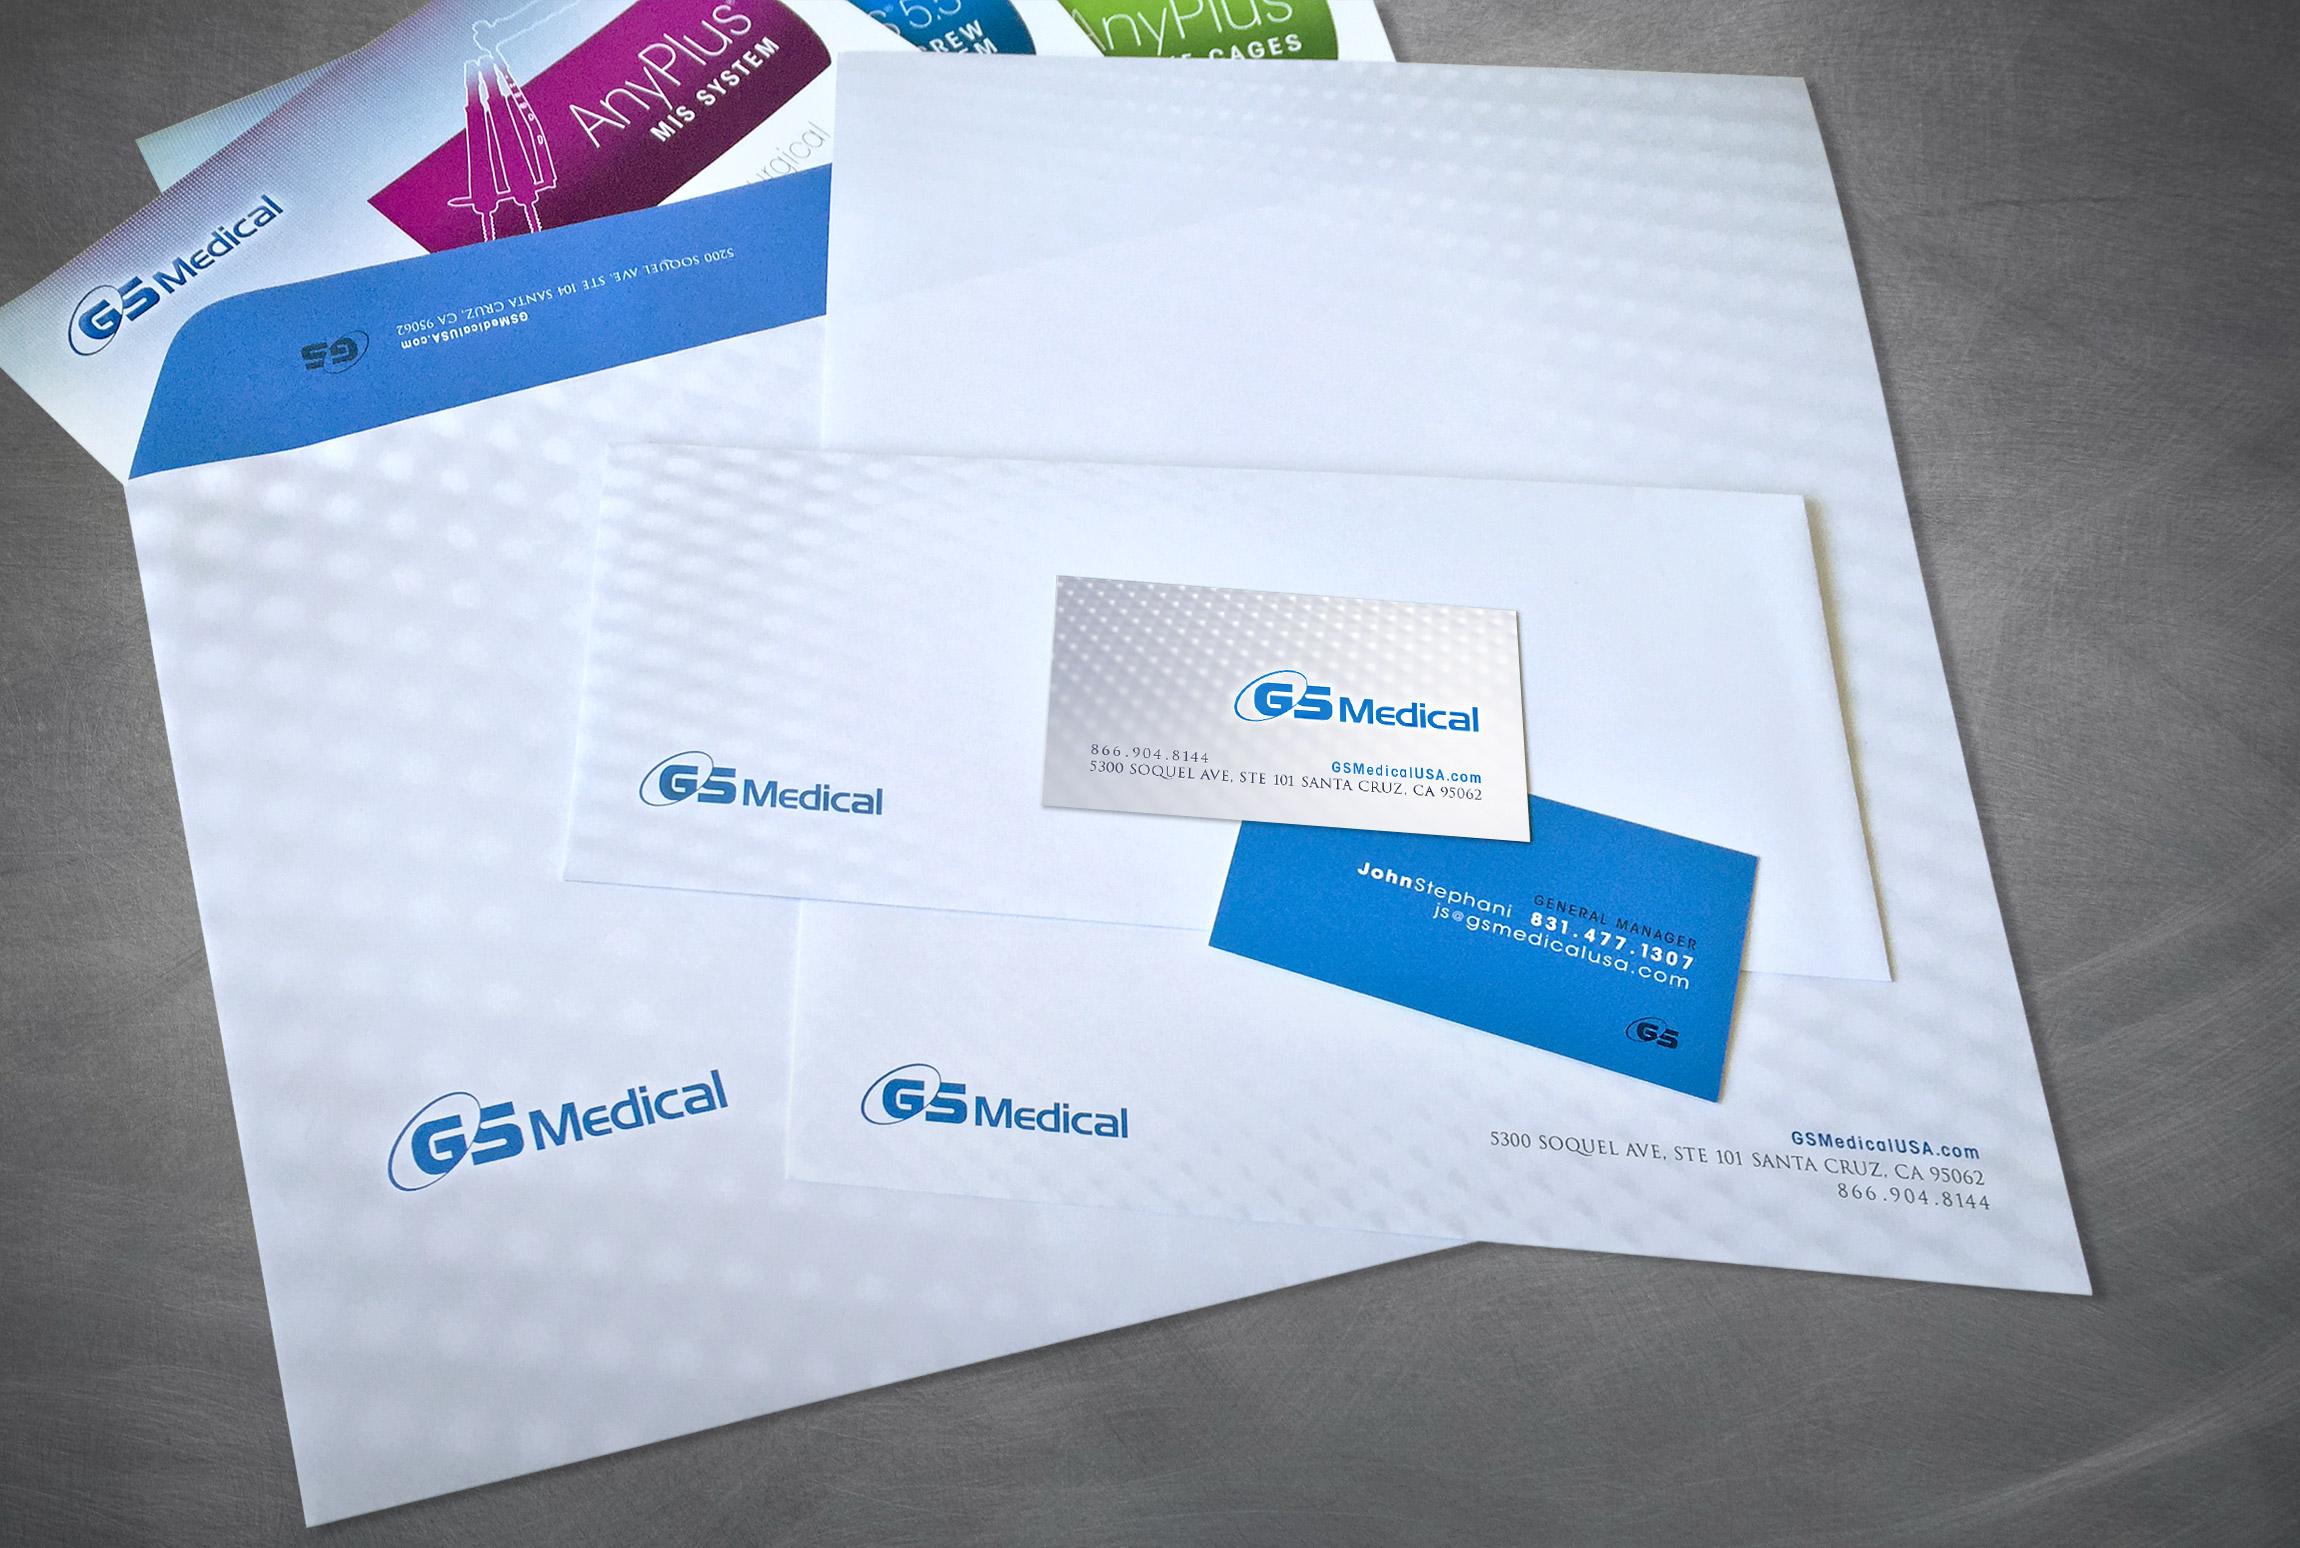 GS Medical USA Stationery Branding Business Card Letterhead Envelope - Graphic Regime